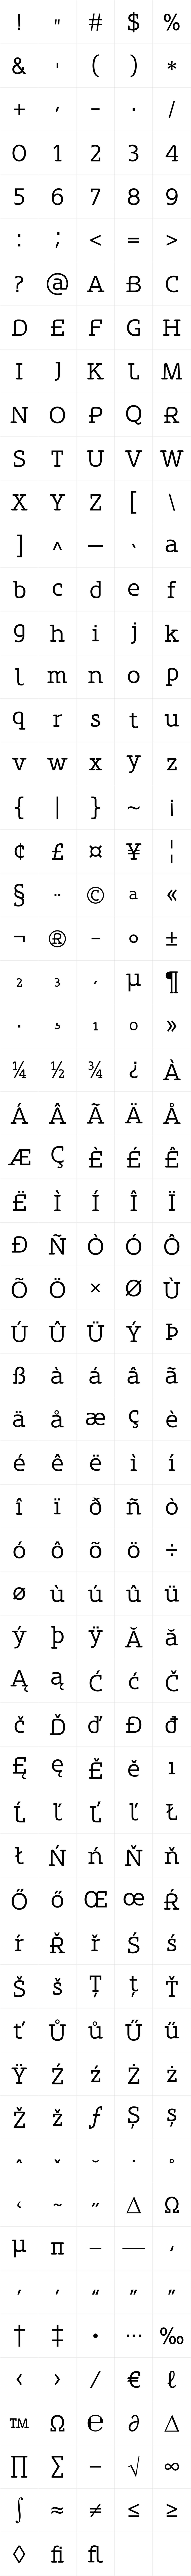 Oblik Serif Regular